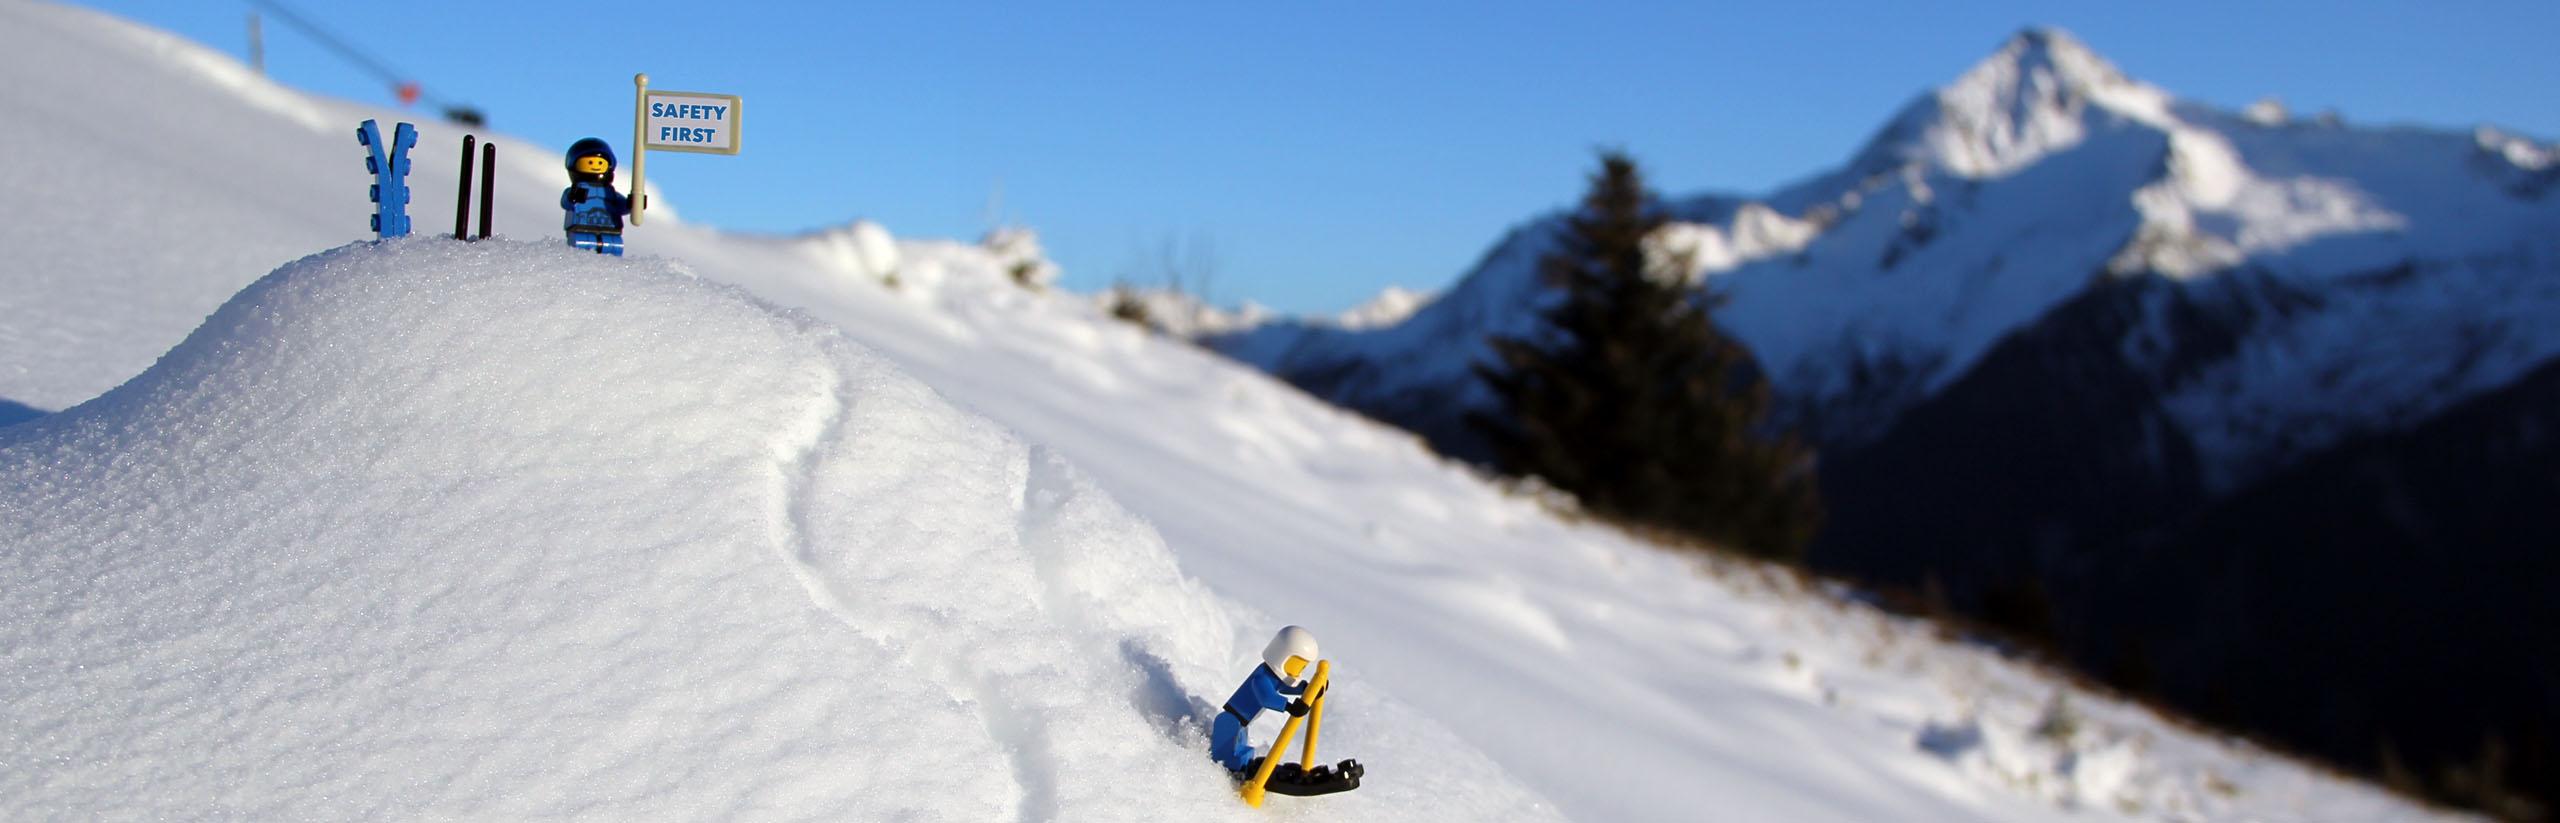 Corona Mayrhofen